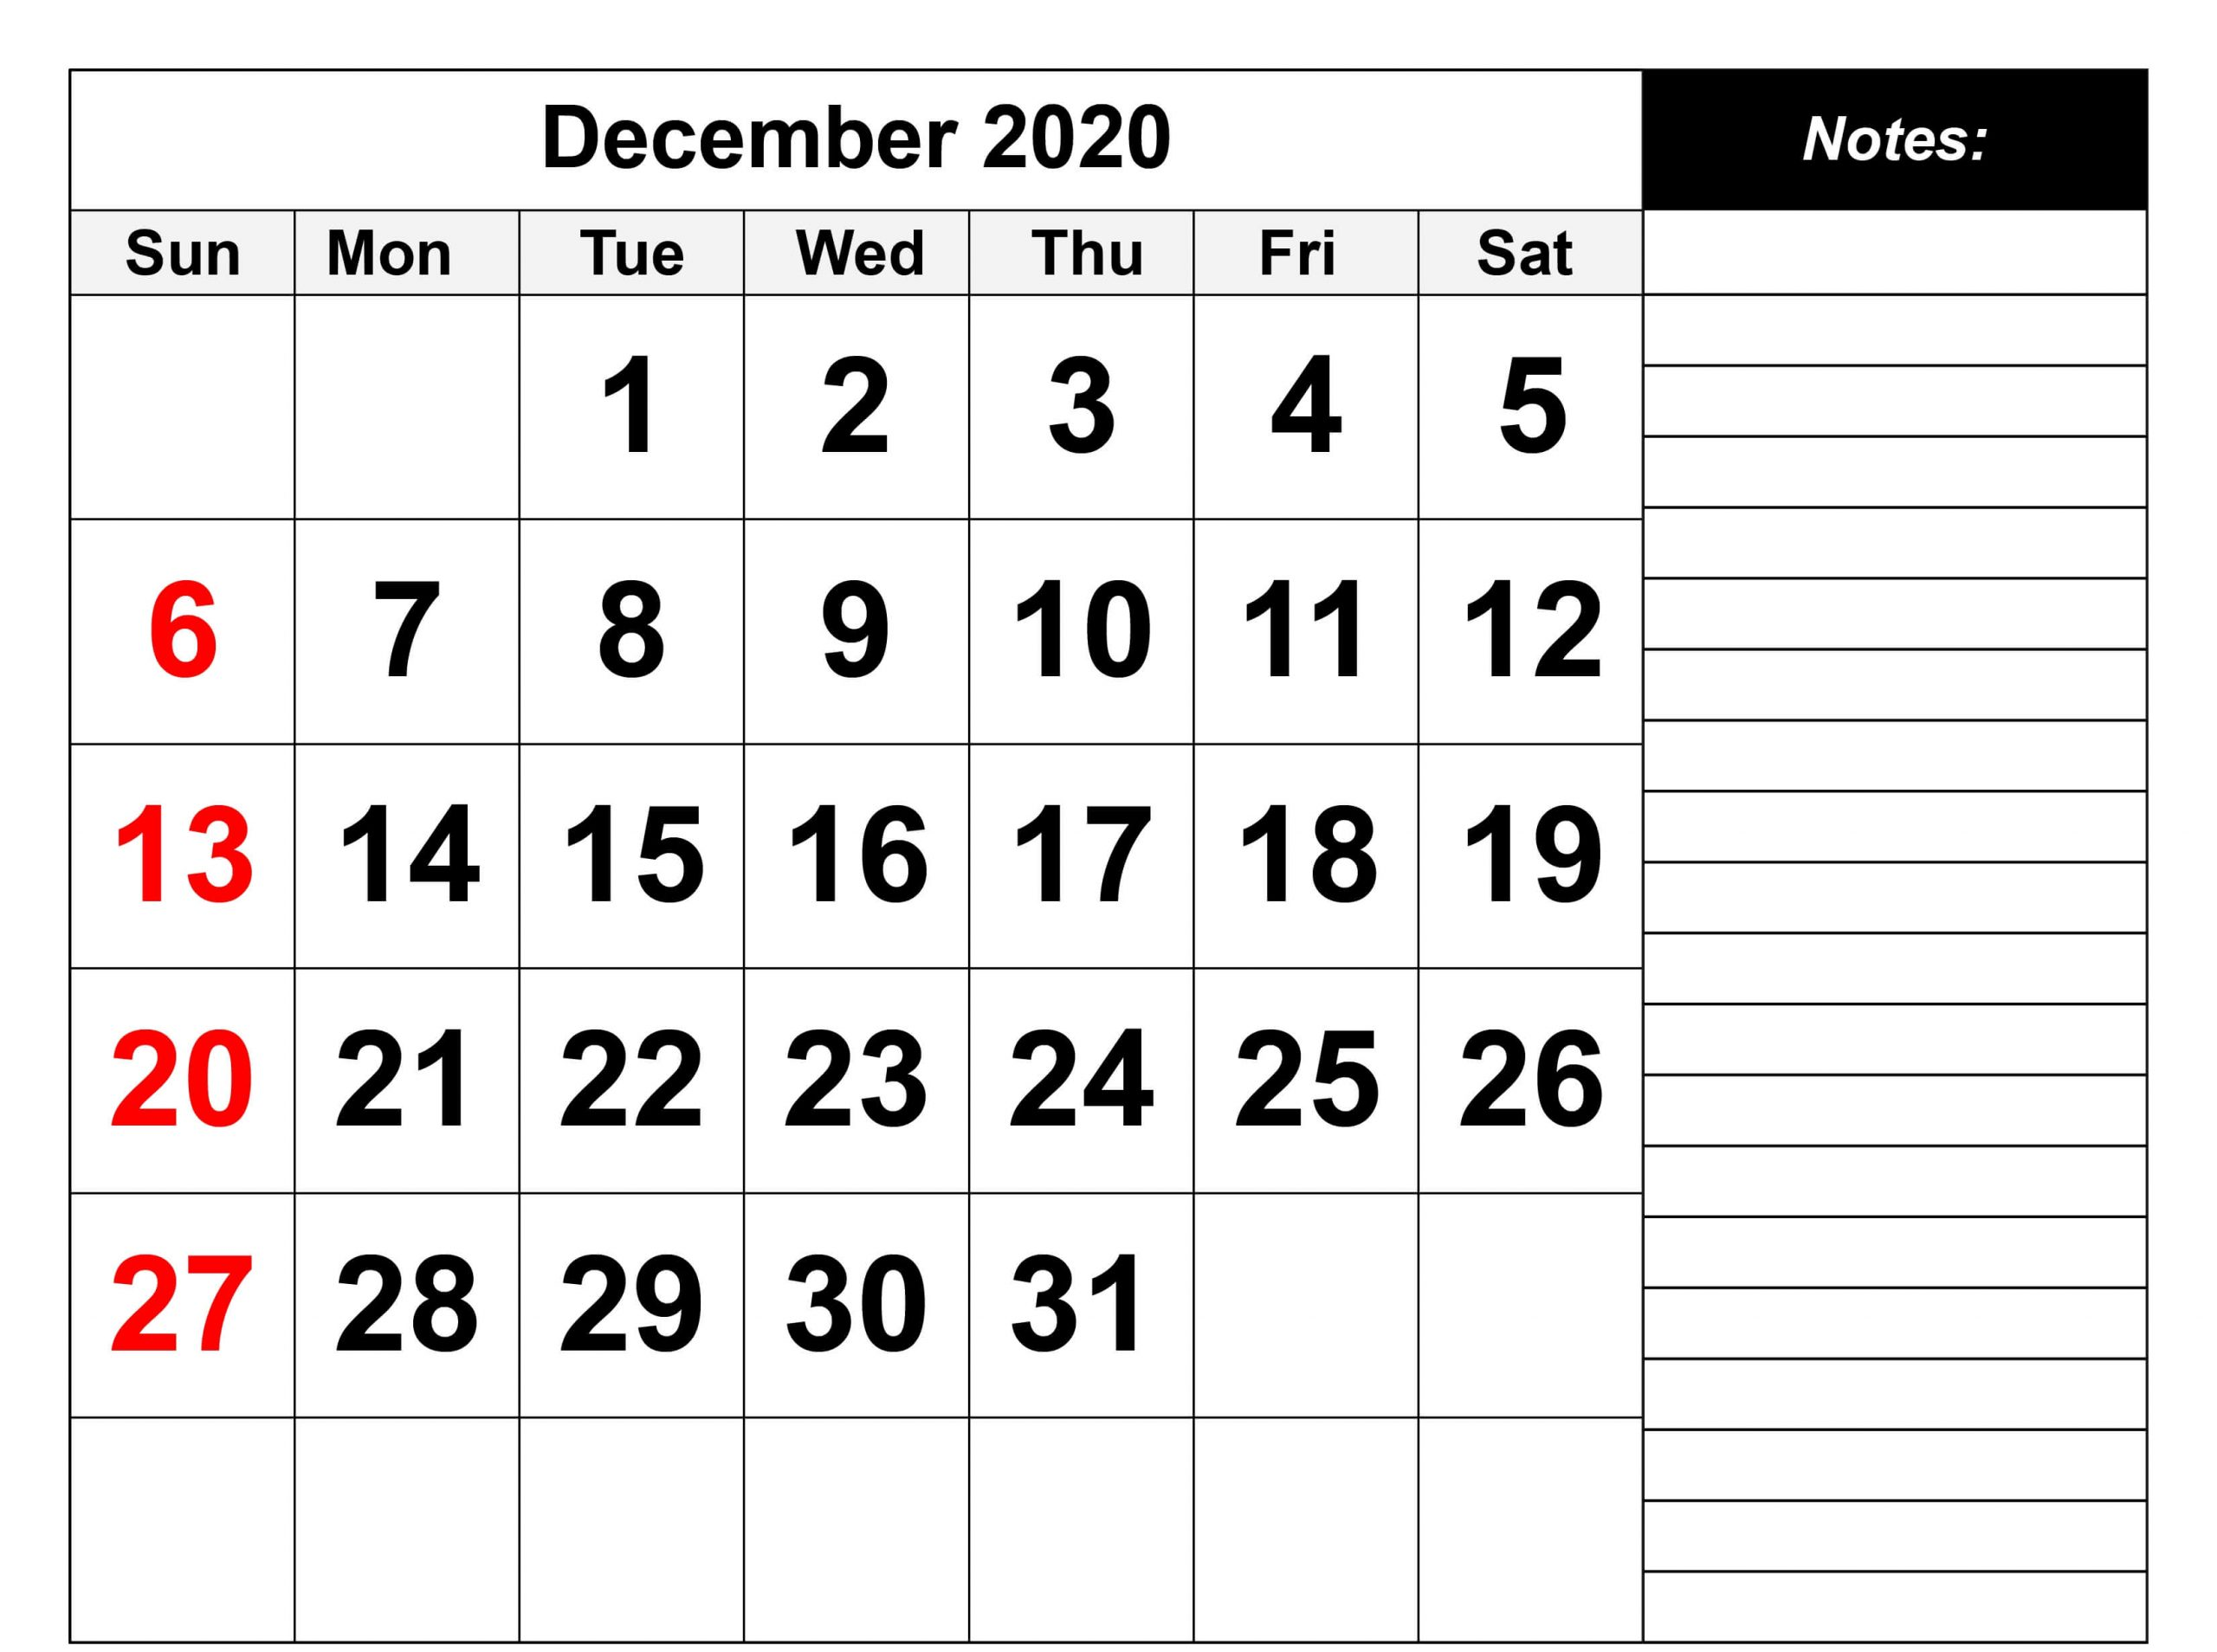 Blank December 2020 Calendar Template